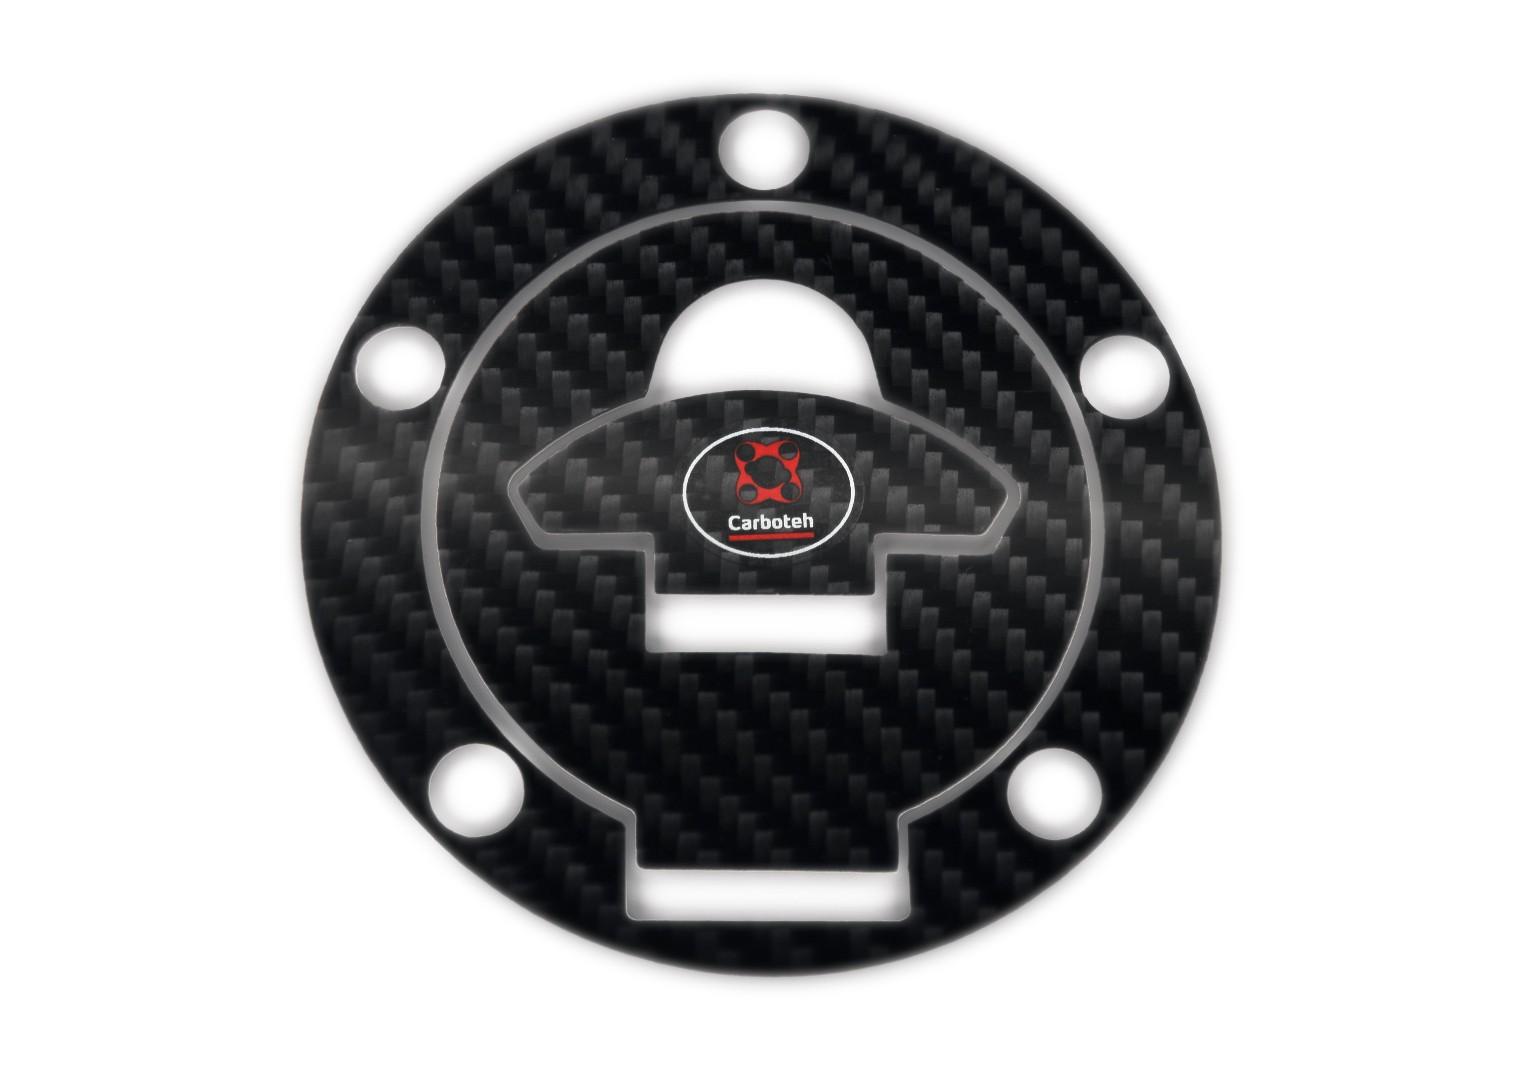 NOS Quicksilver Mercury Mercruiser Gear Housing Retainer 79448 Qty 1